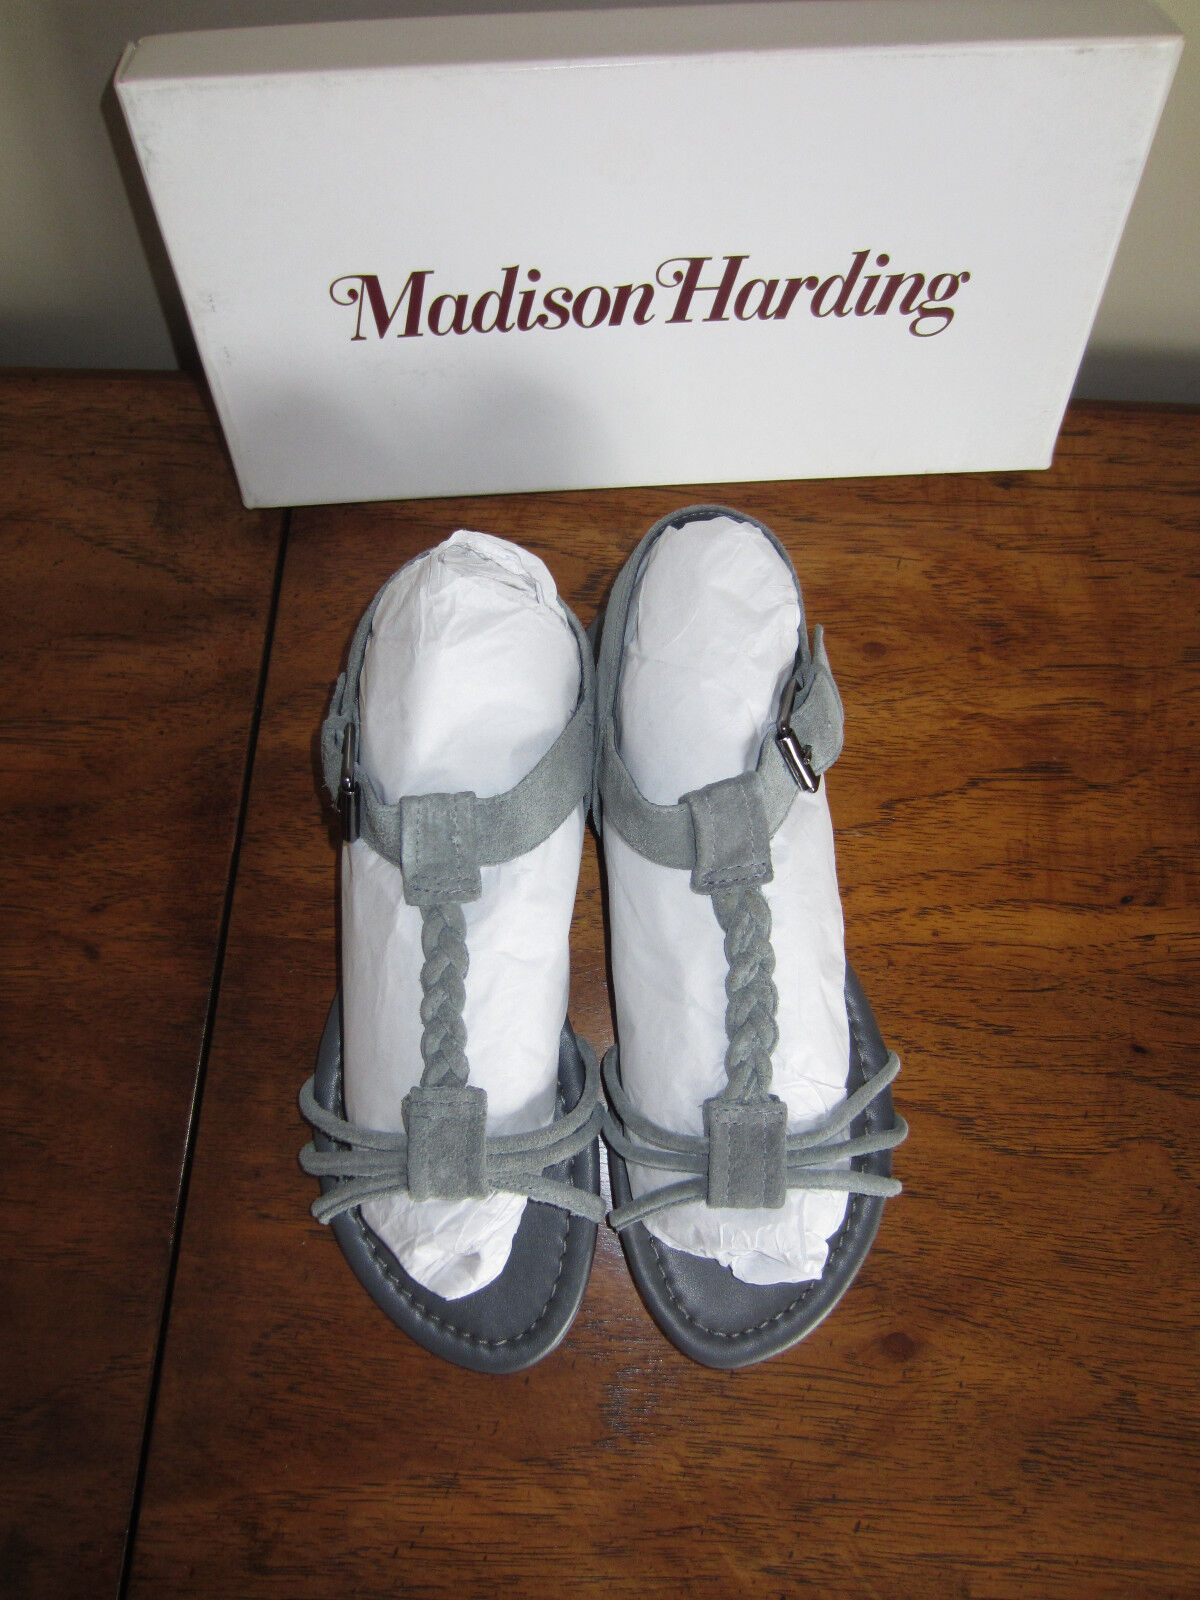 NIB Madison Harding grigio Suede Suede Suede Corrinna Leather Sandals 7 Braided Strappy Flat 3a2af7